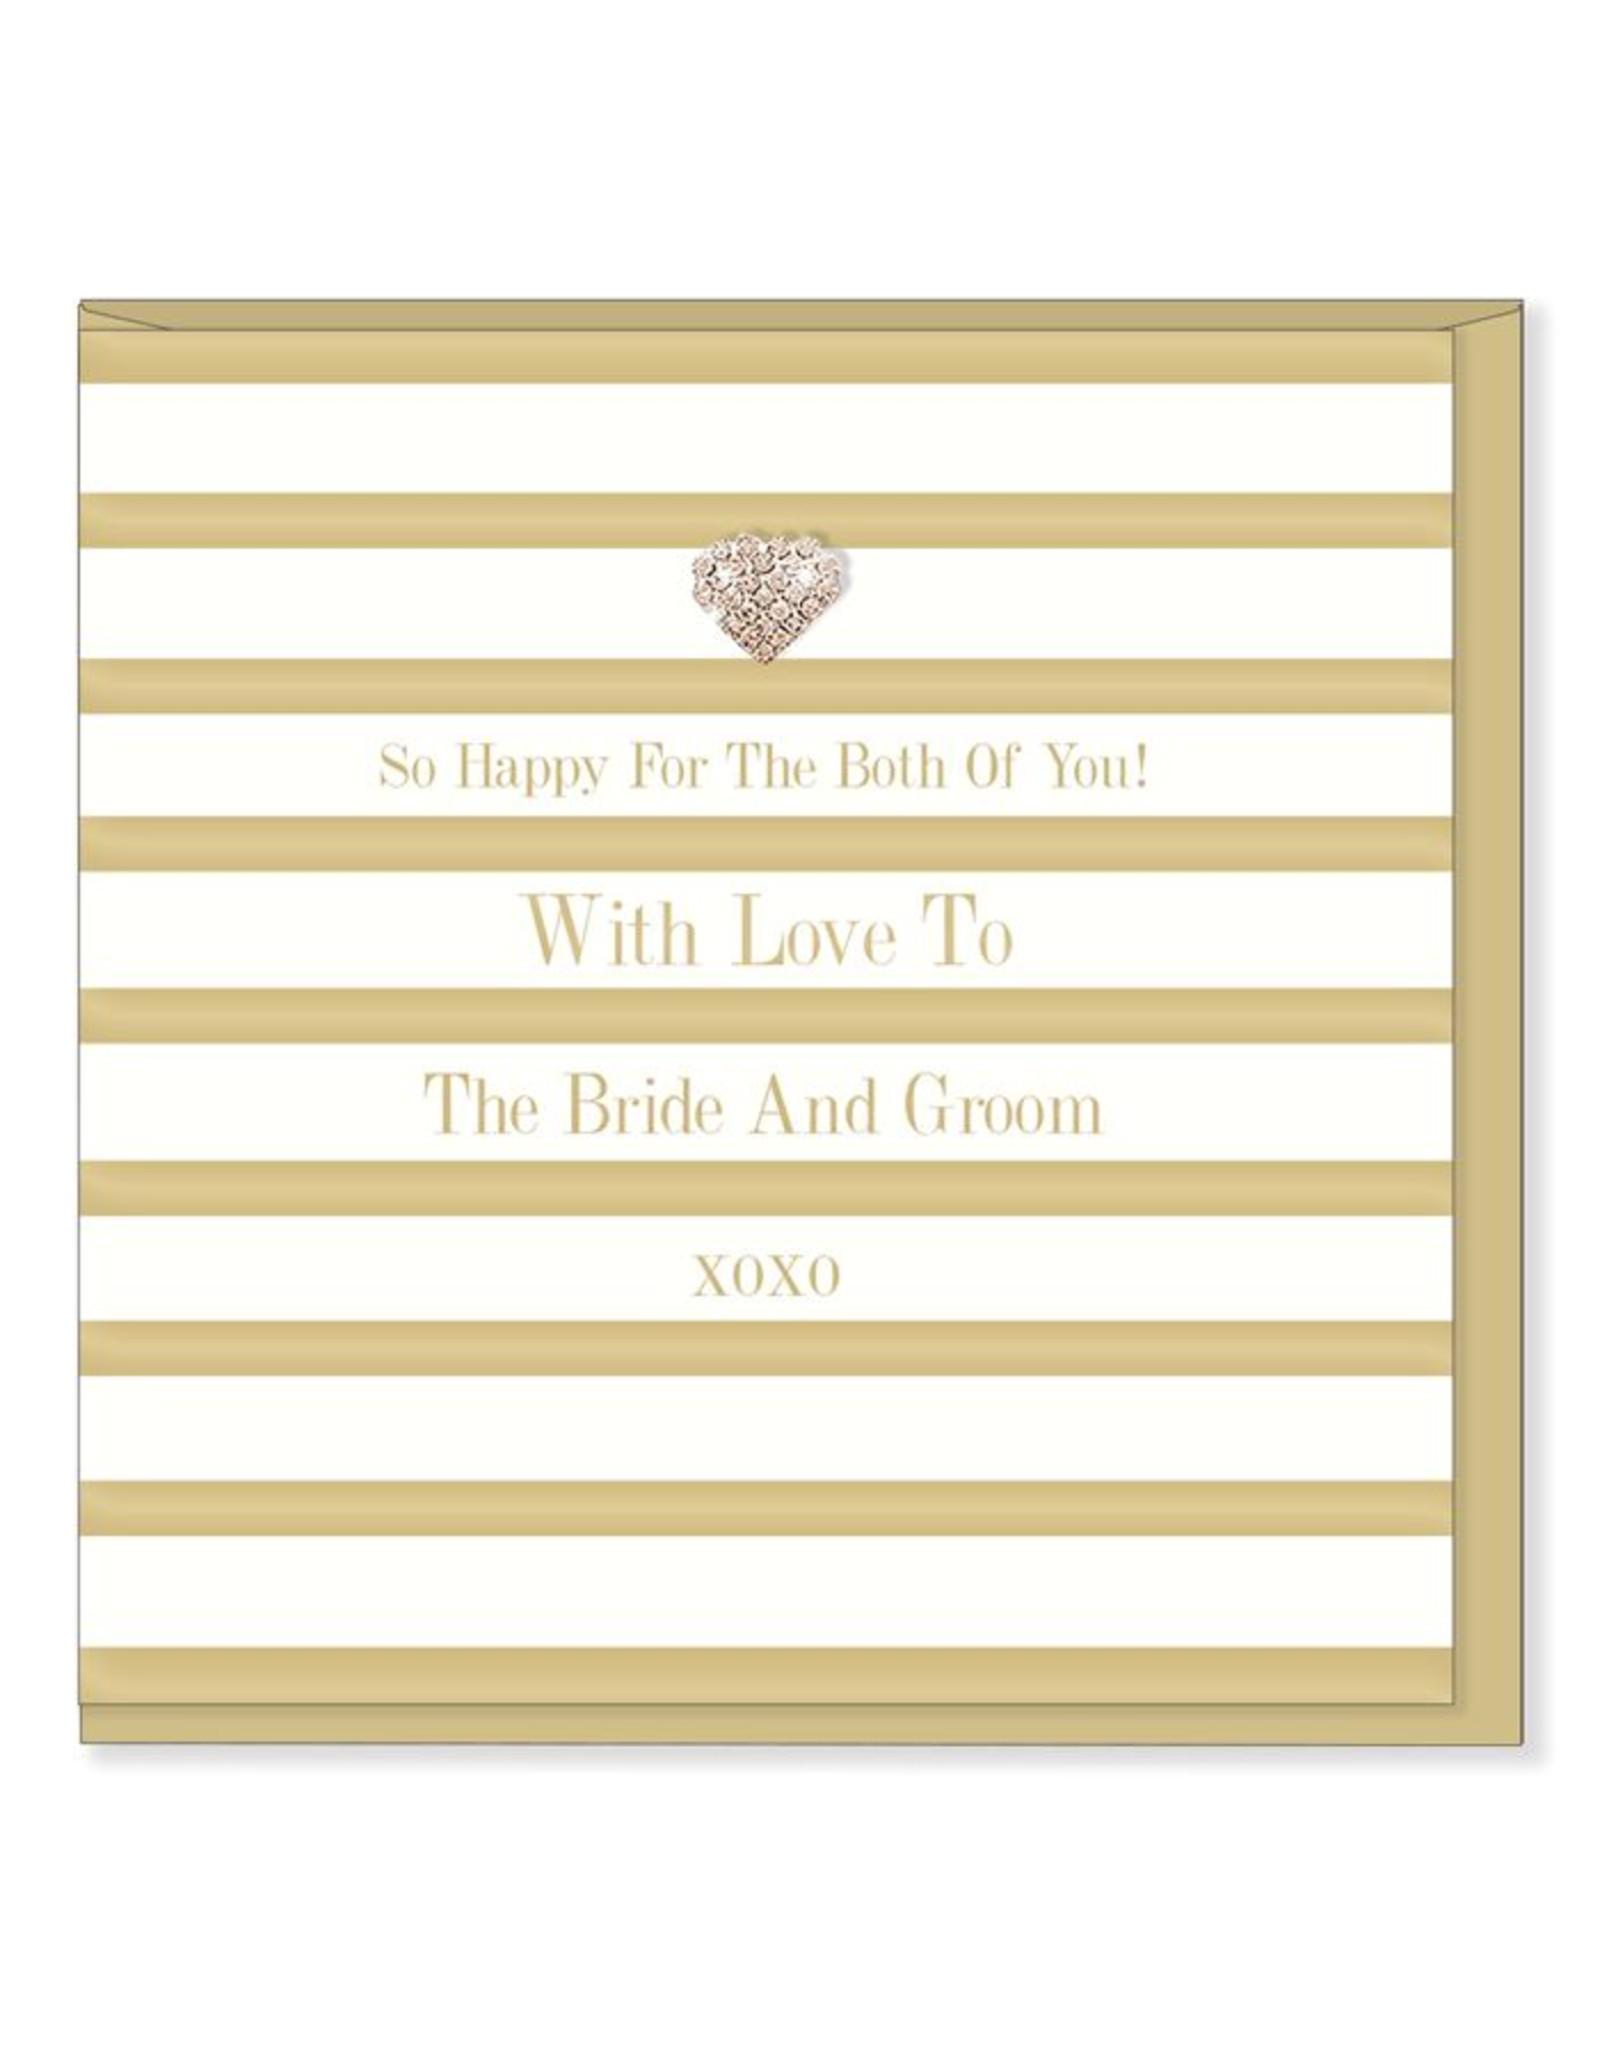 Hearts Design Wenskaart - With Love to the Bride & Groom